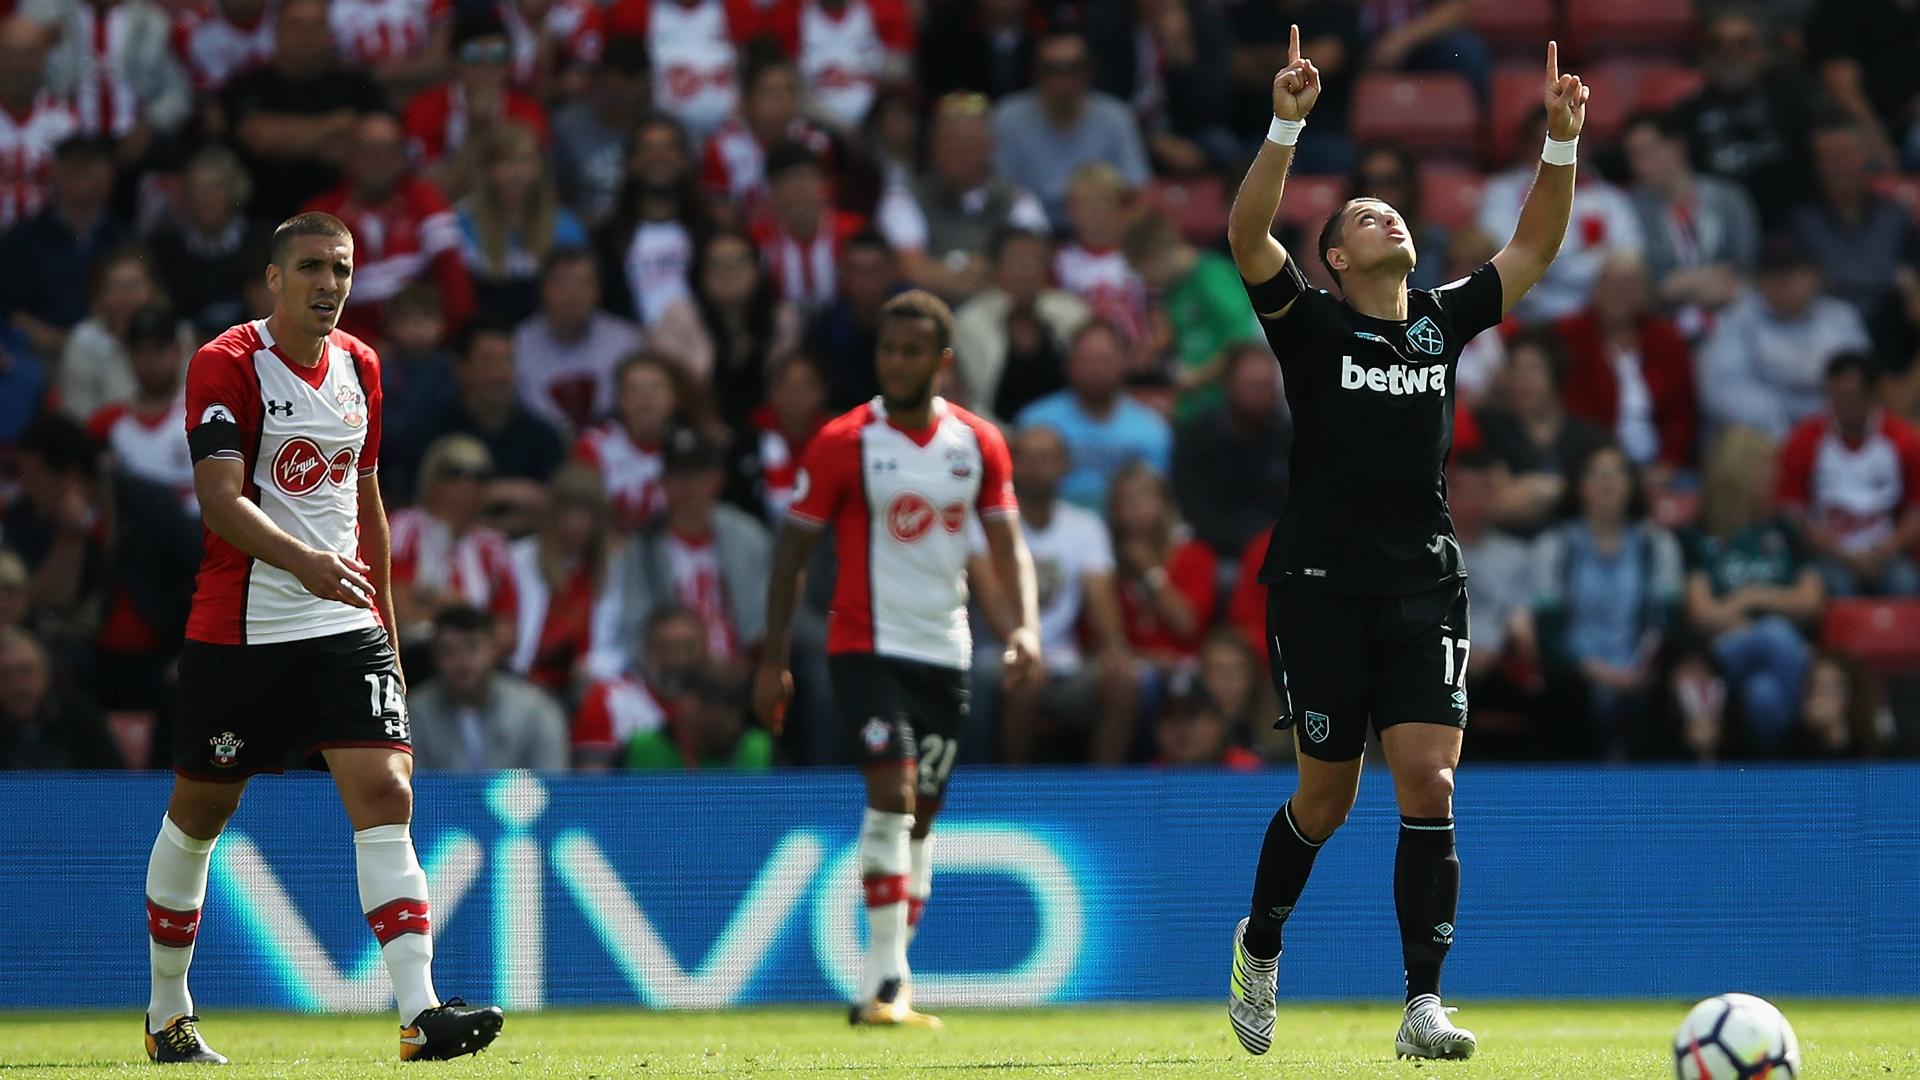 Chicharito West Ham - Southampton